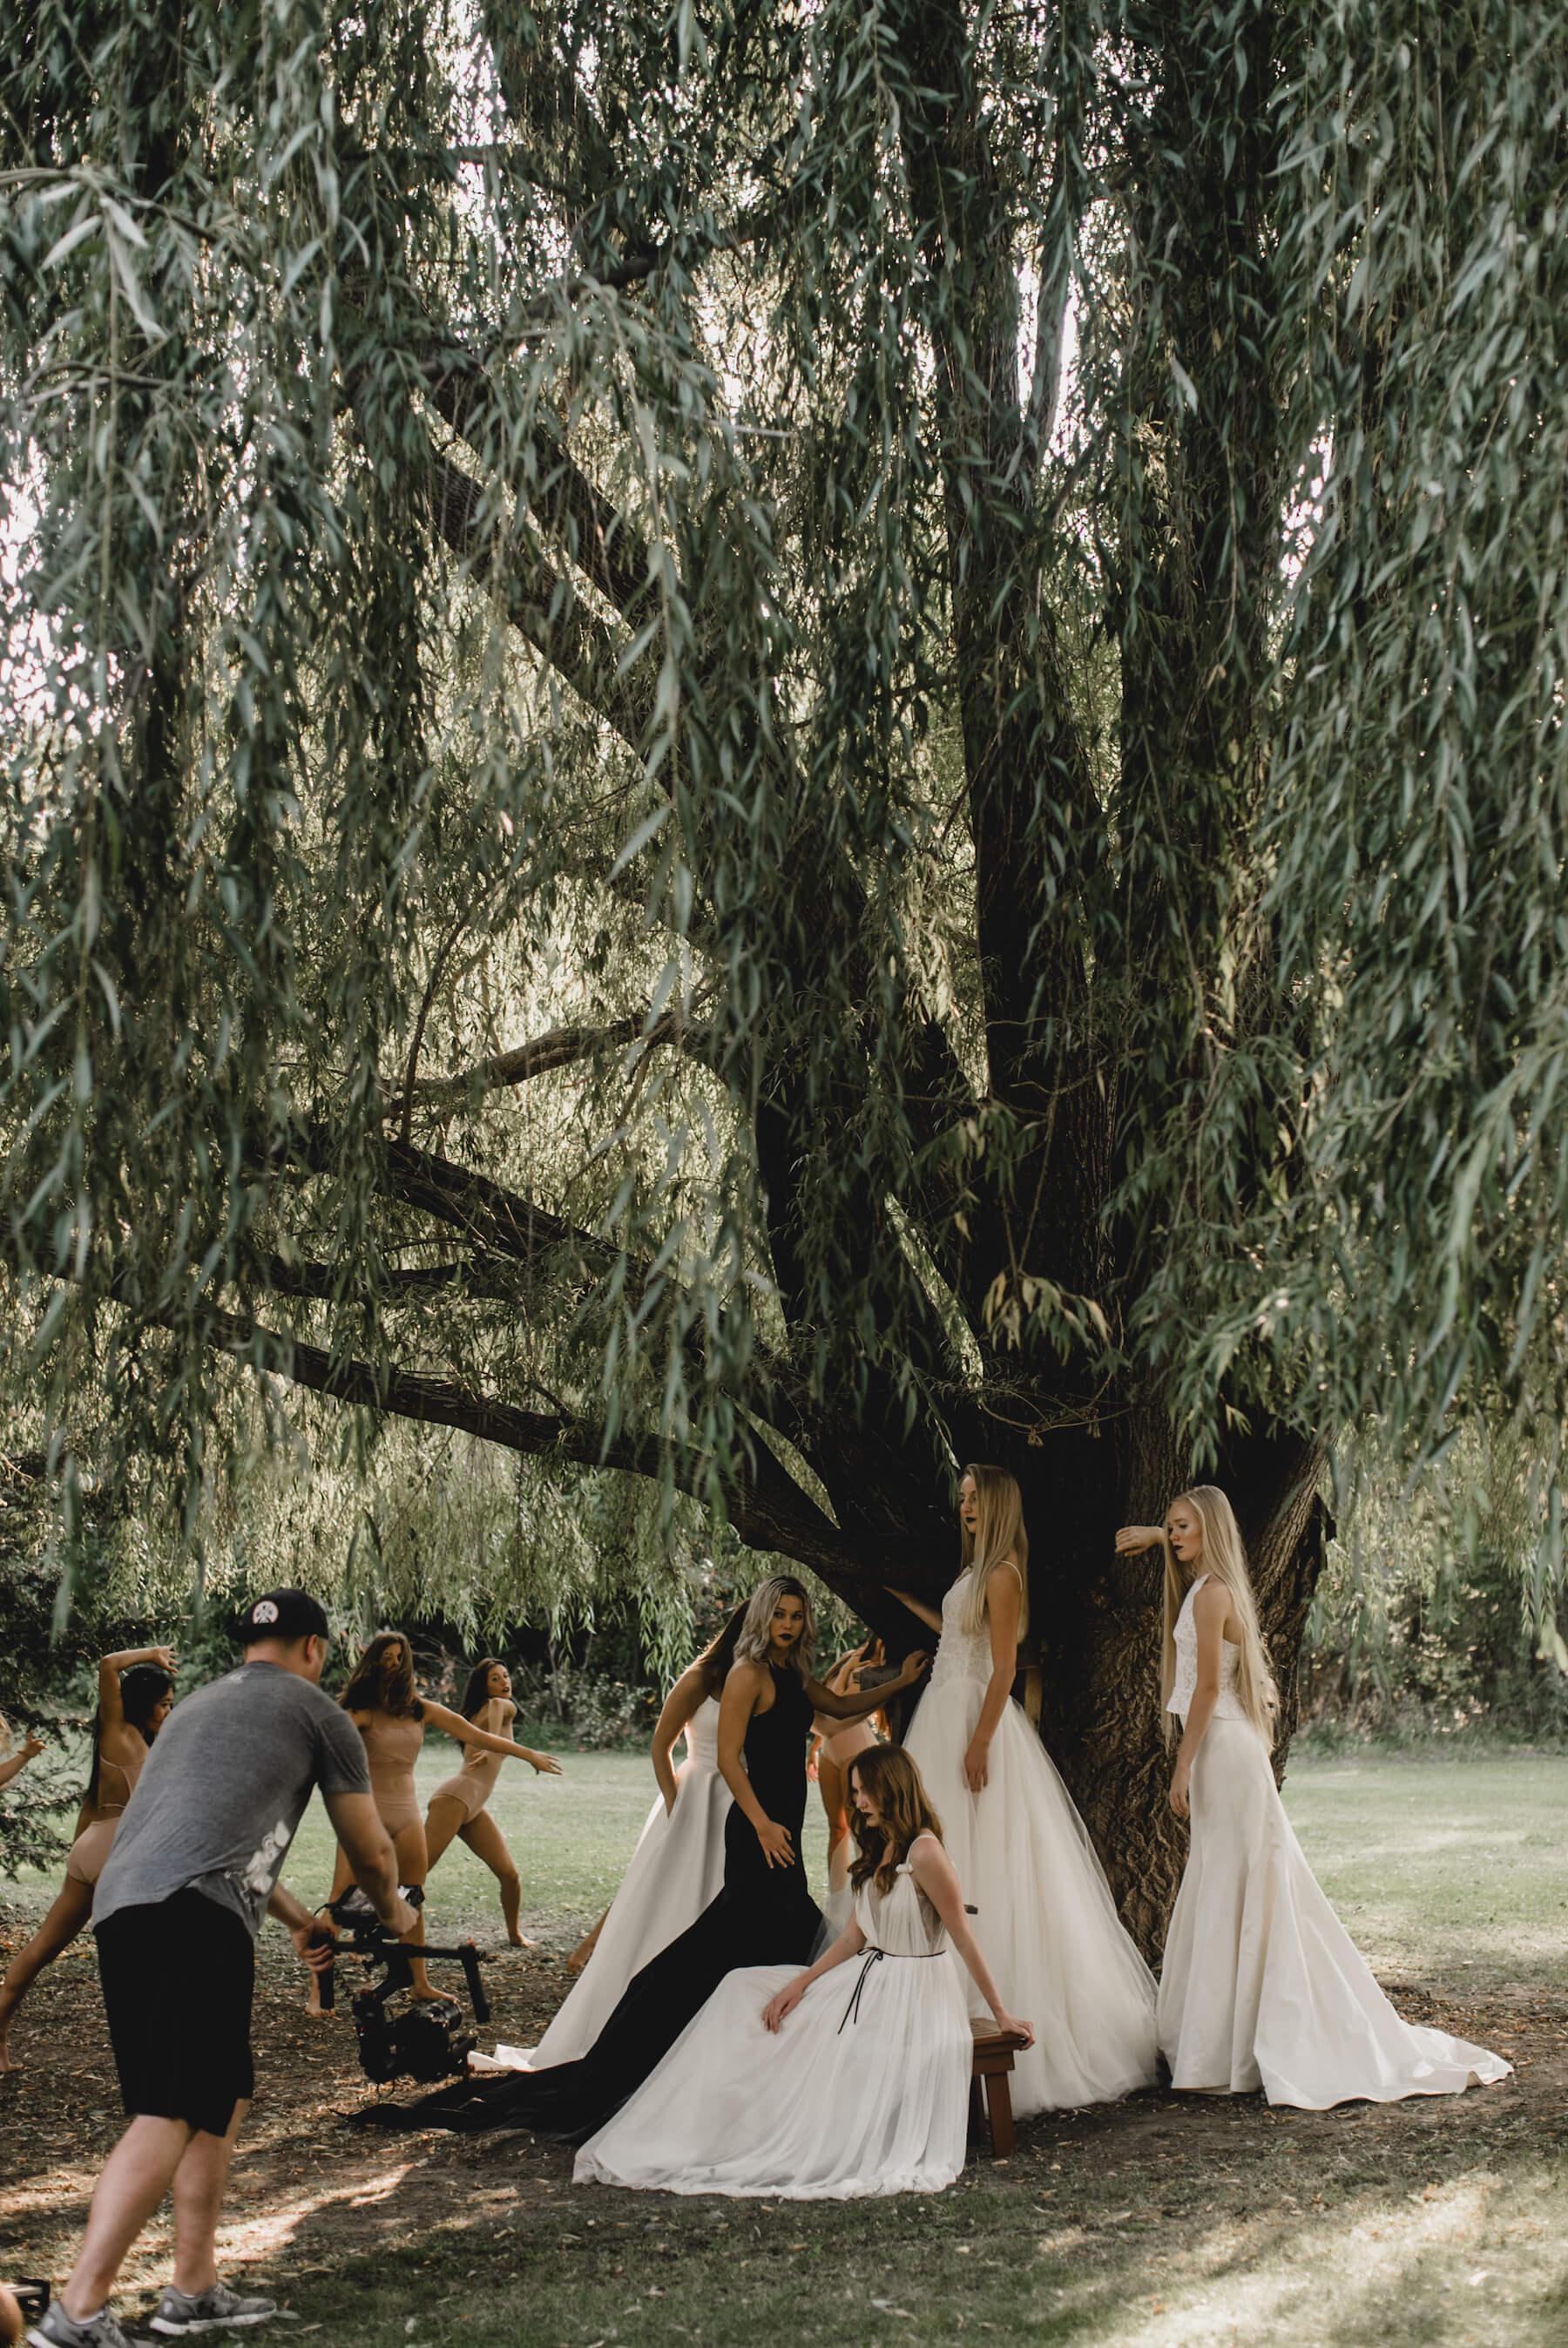 acowsay-cinema-tara-latour-wedding-designer-bts- (106 of 124).jpg